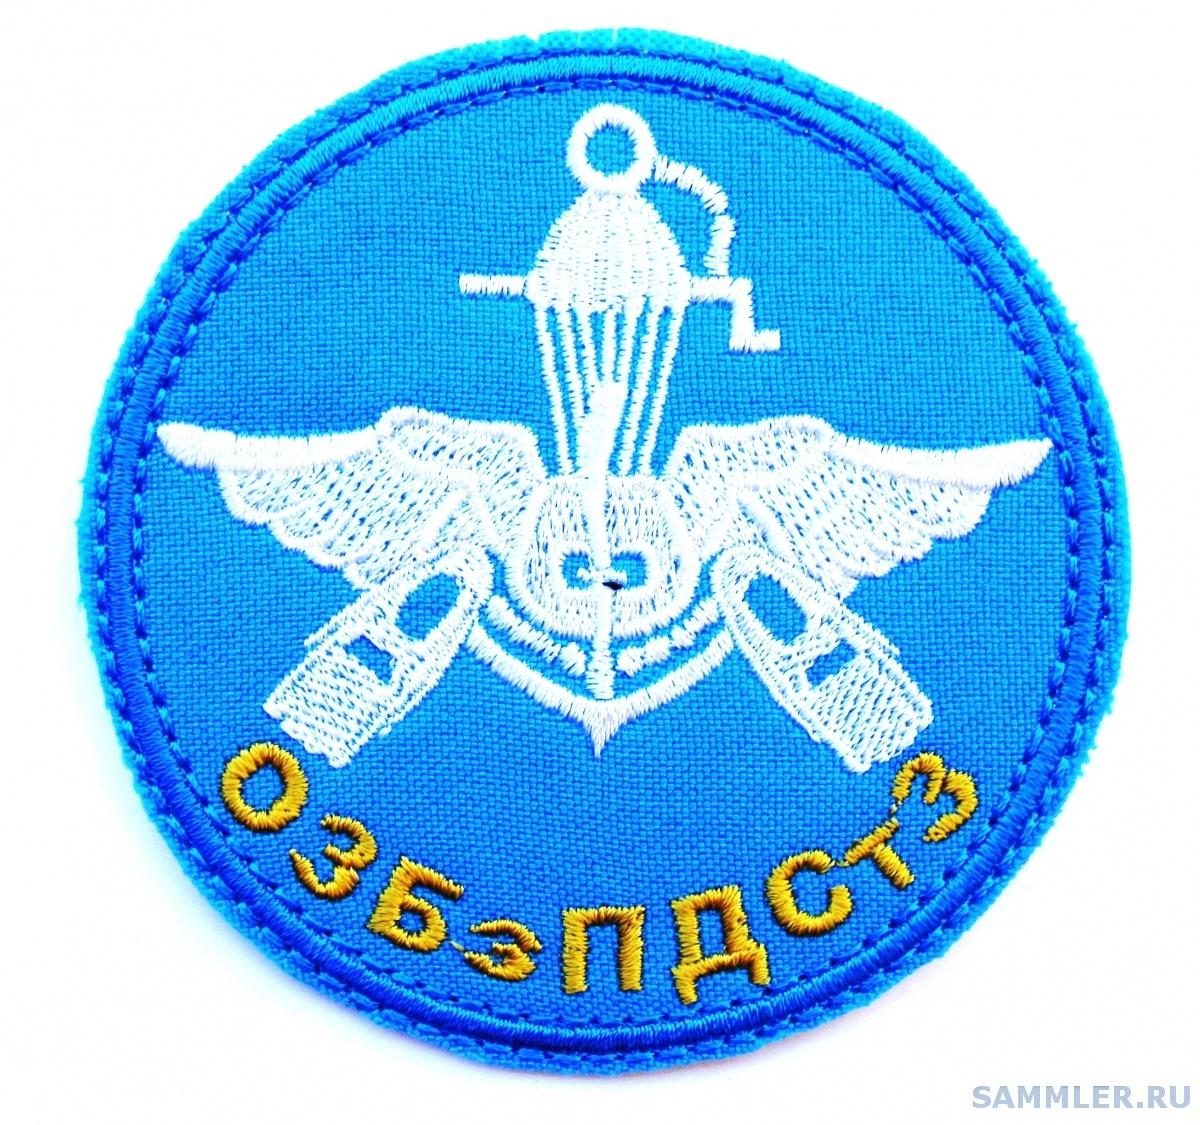 4456938266-UA-PTSF-00018.jpg